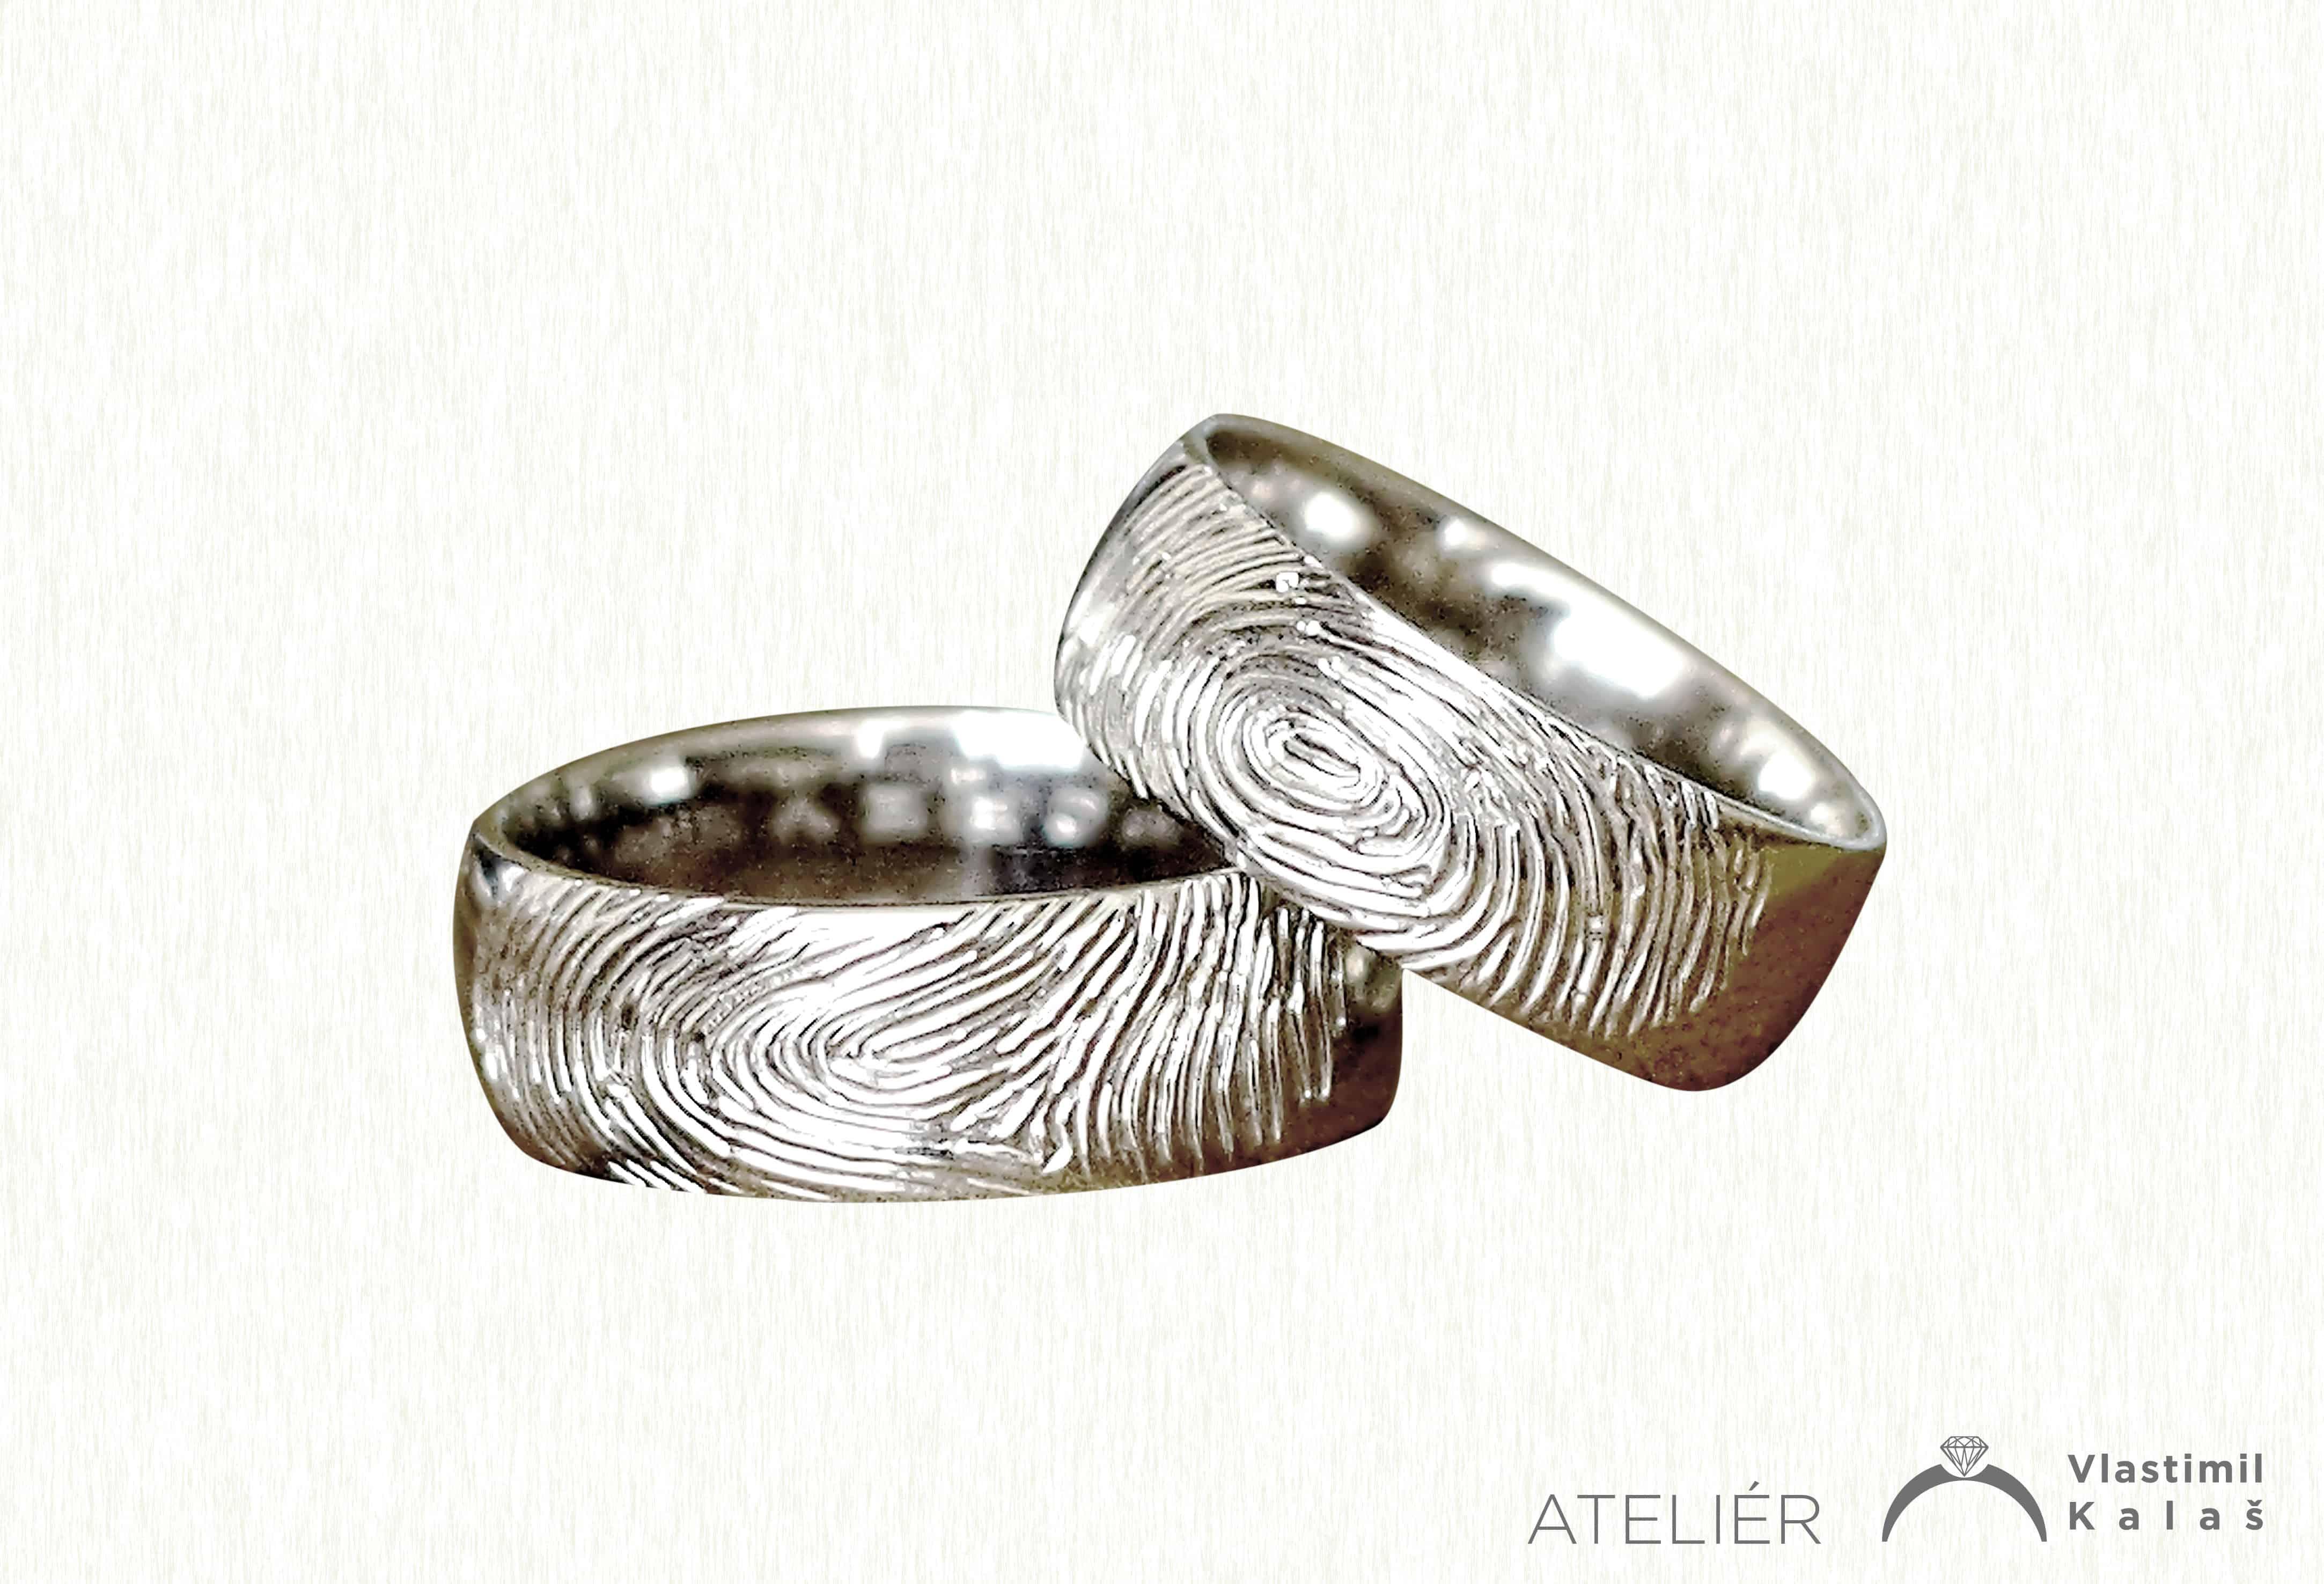 Pravda O Snubnich Prstenech Svet Svateb Cz